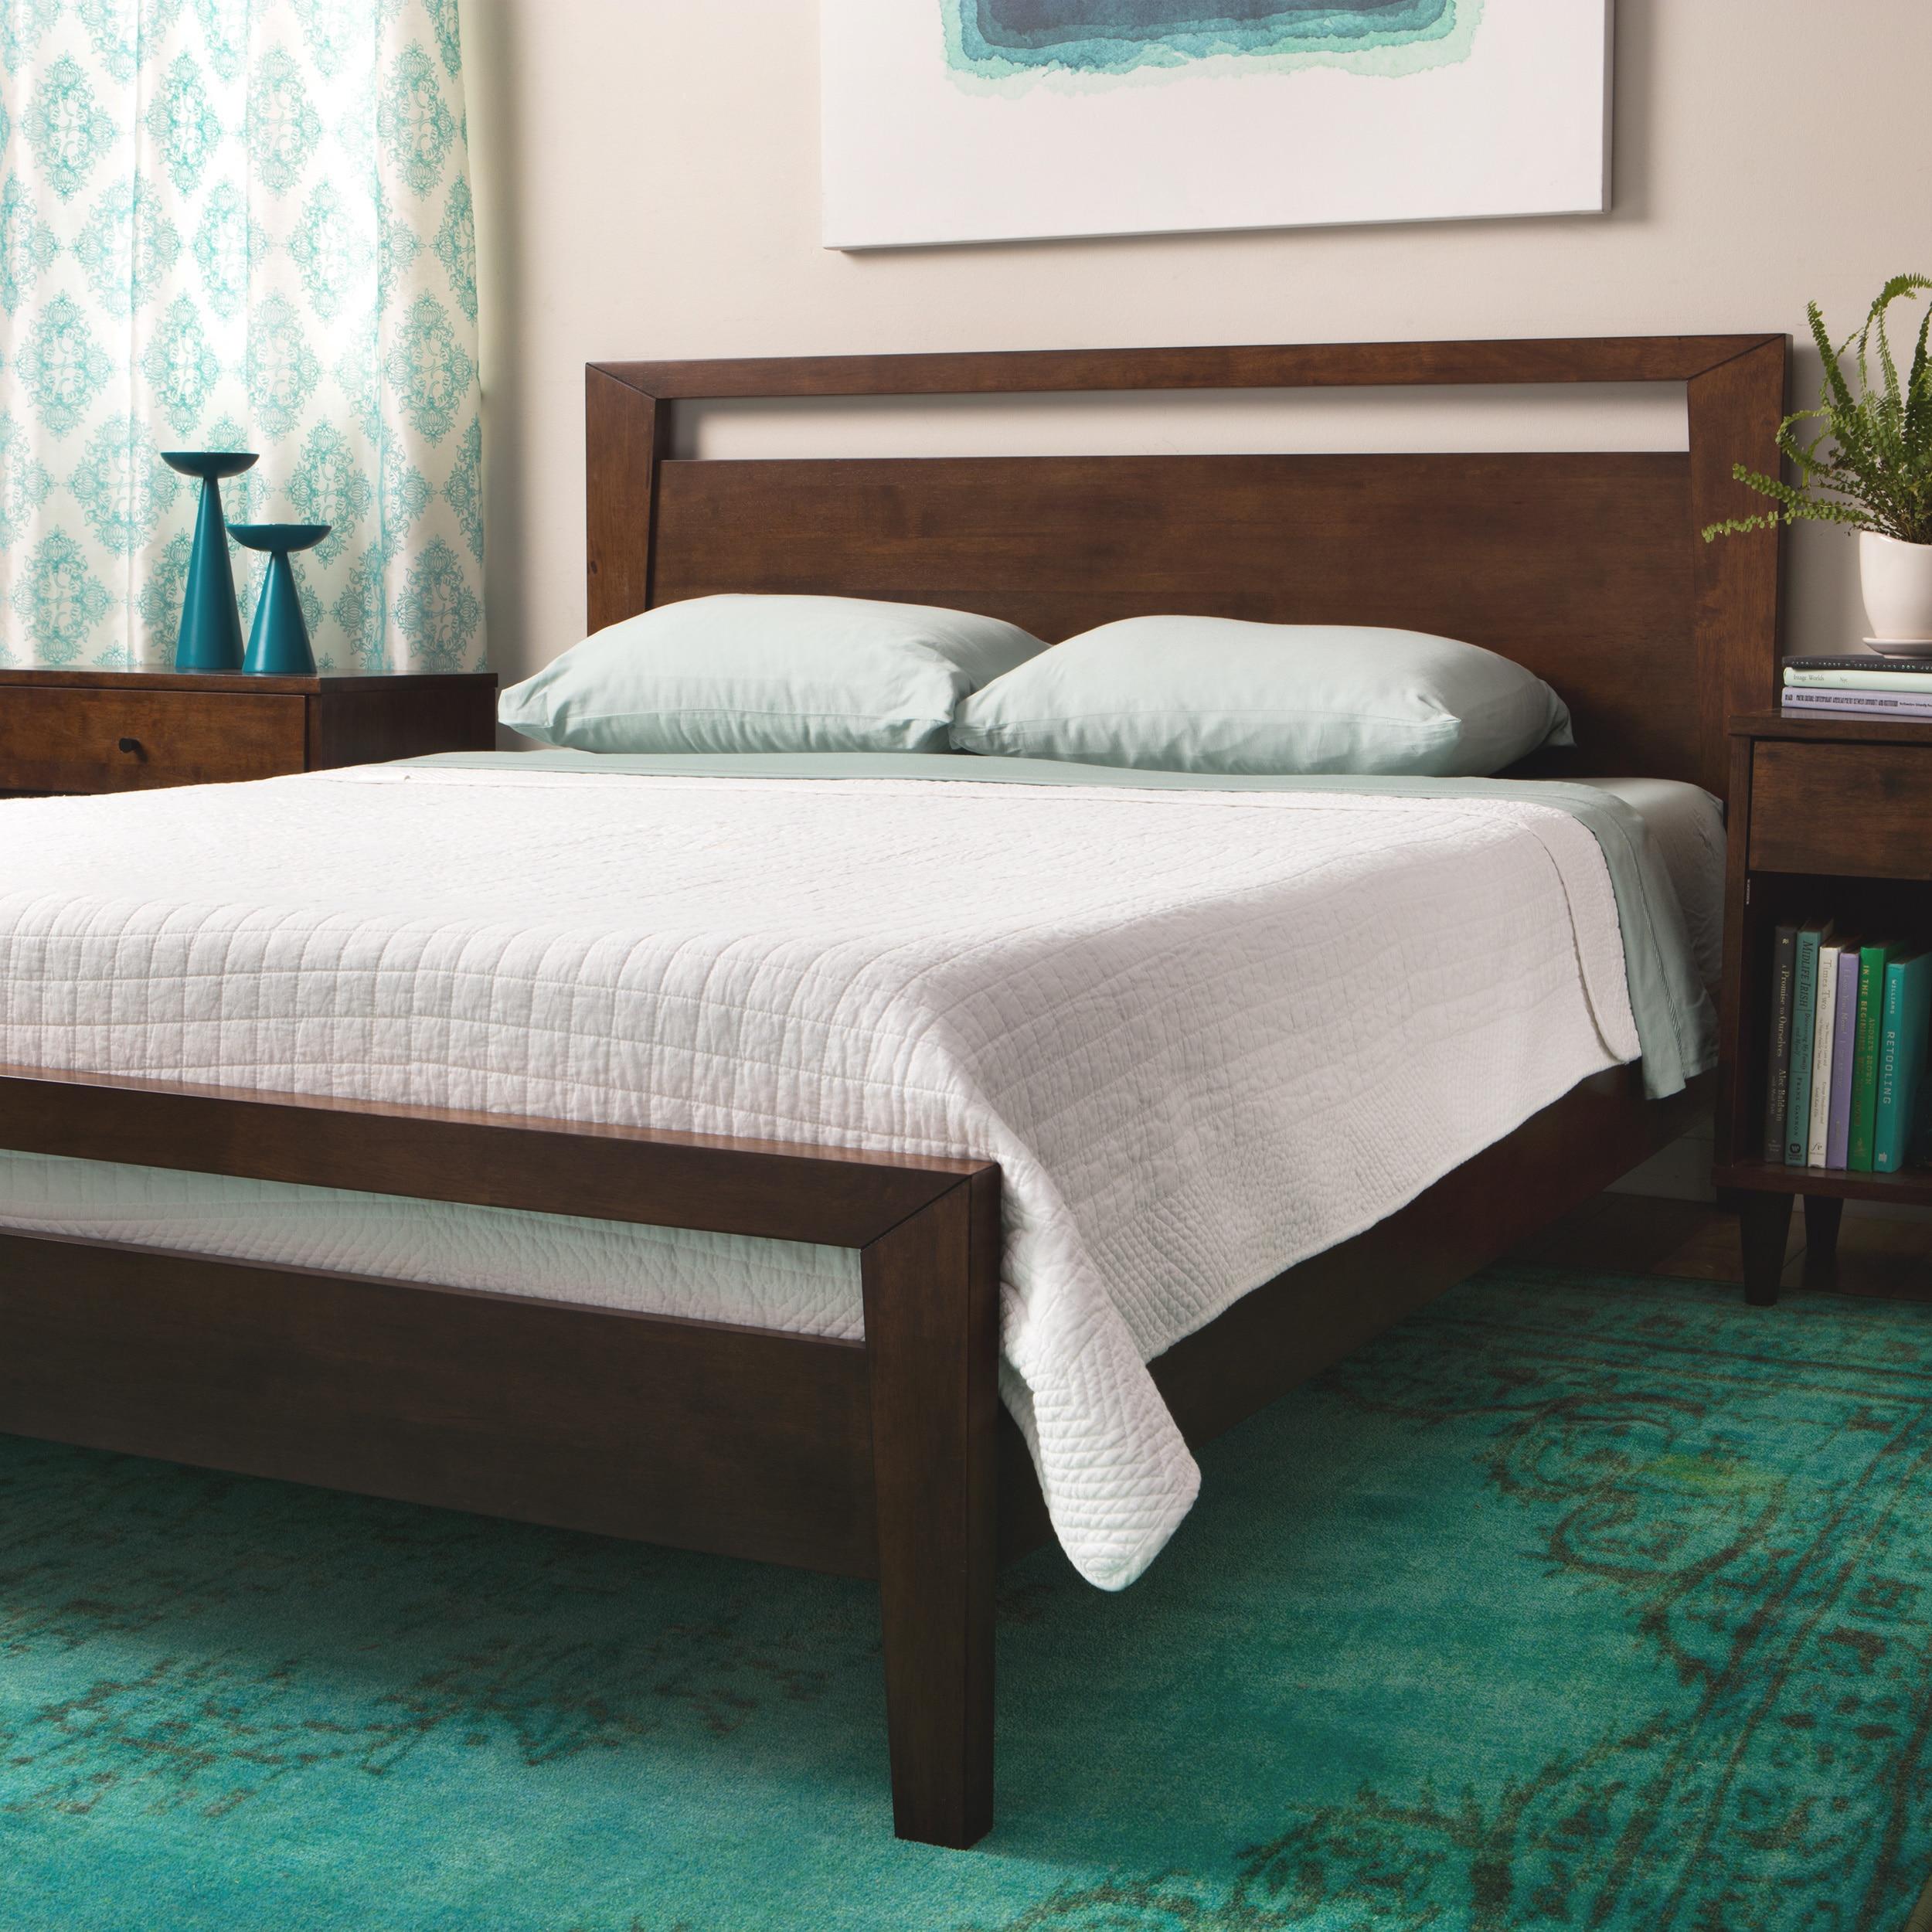 Jasper Laine Kota King Size Platform Bed Free Shipping Today 7123130